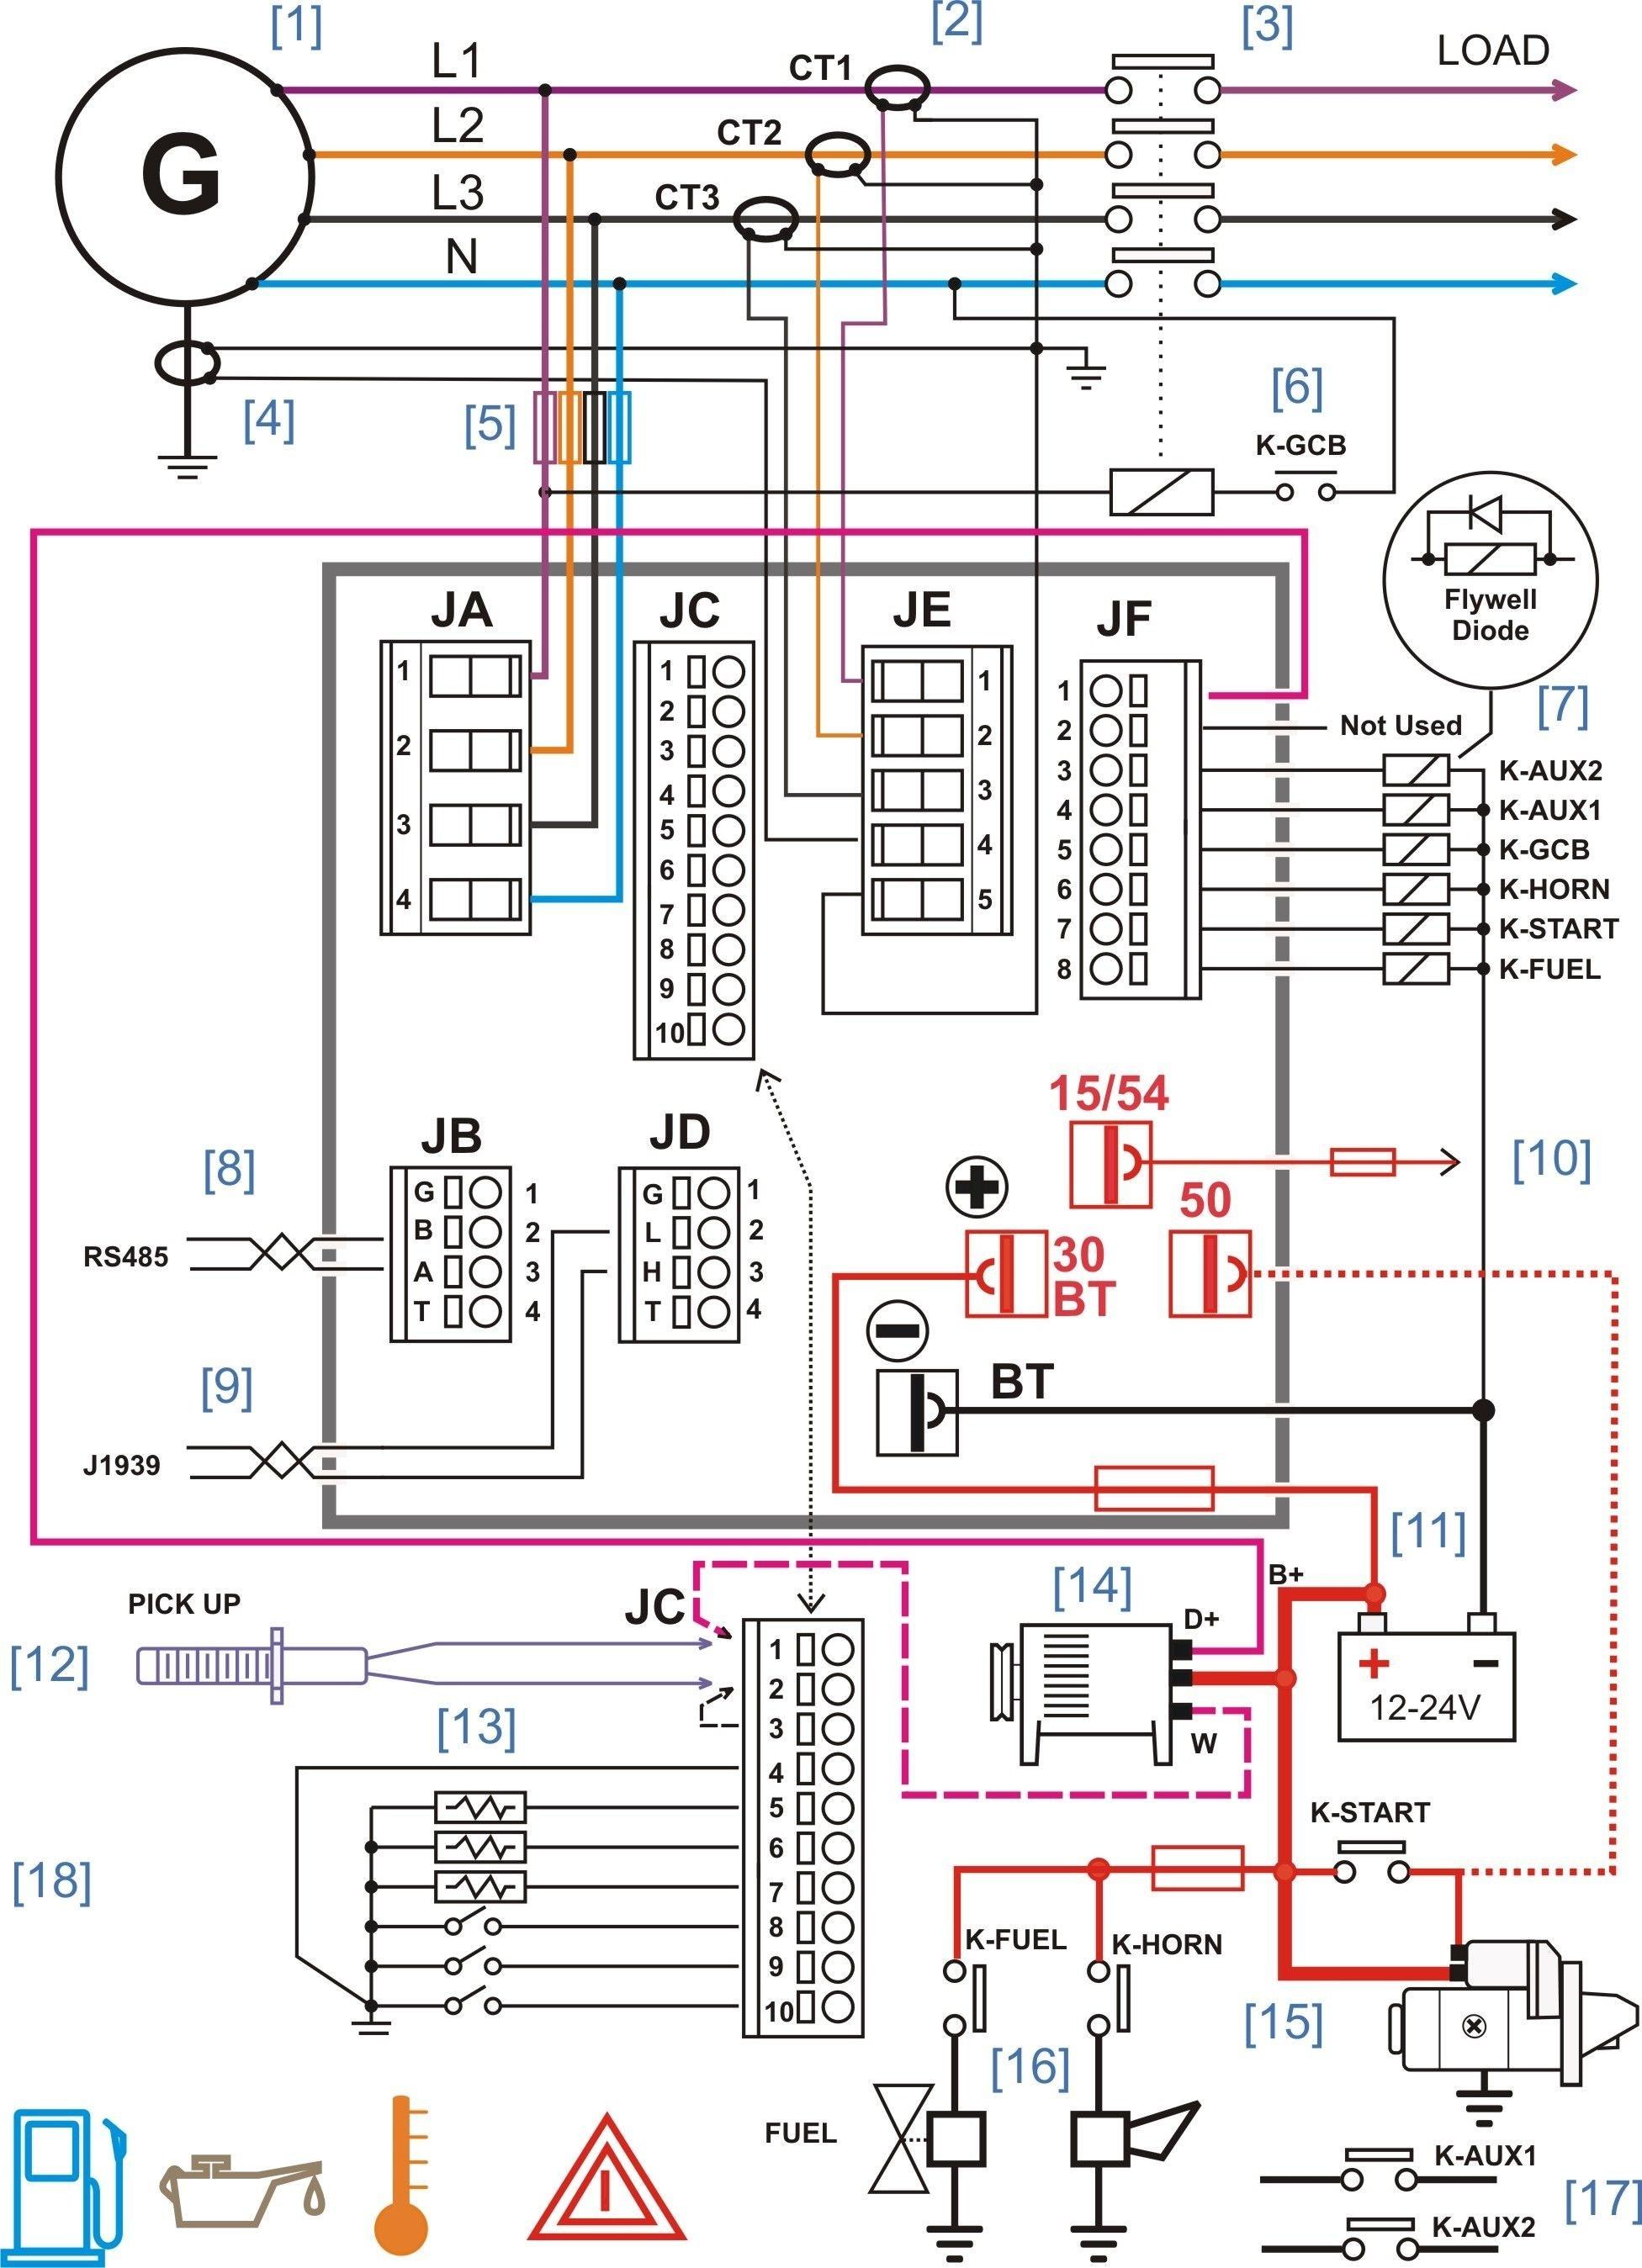 hvac wiring diagram software Download-network wiring diagram software Electrical House Wiring Diagram software 7-g